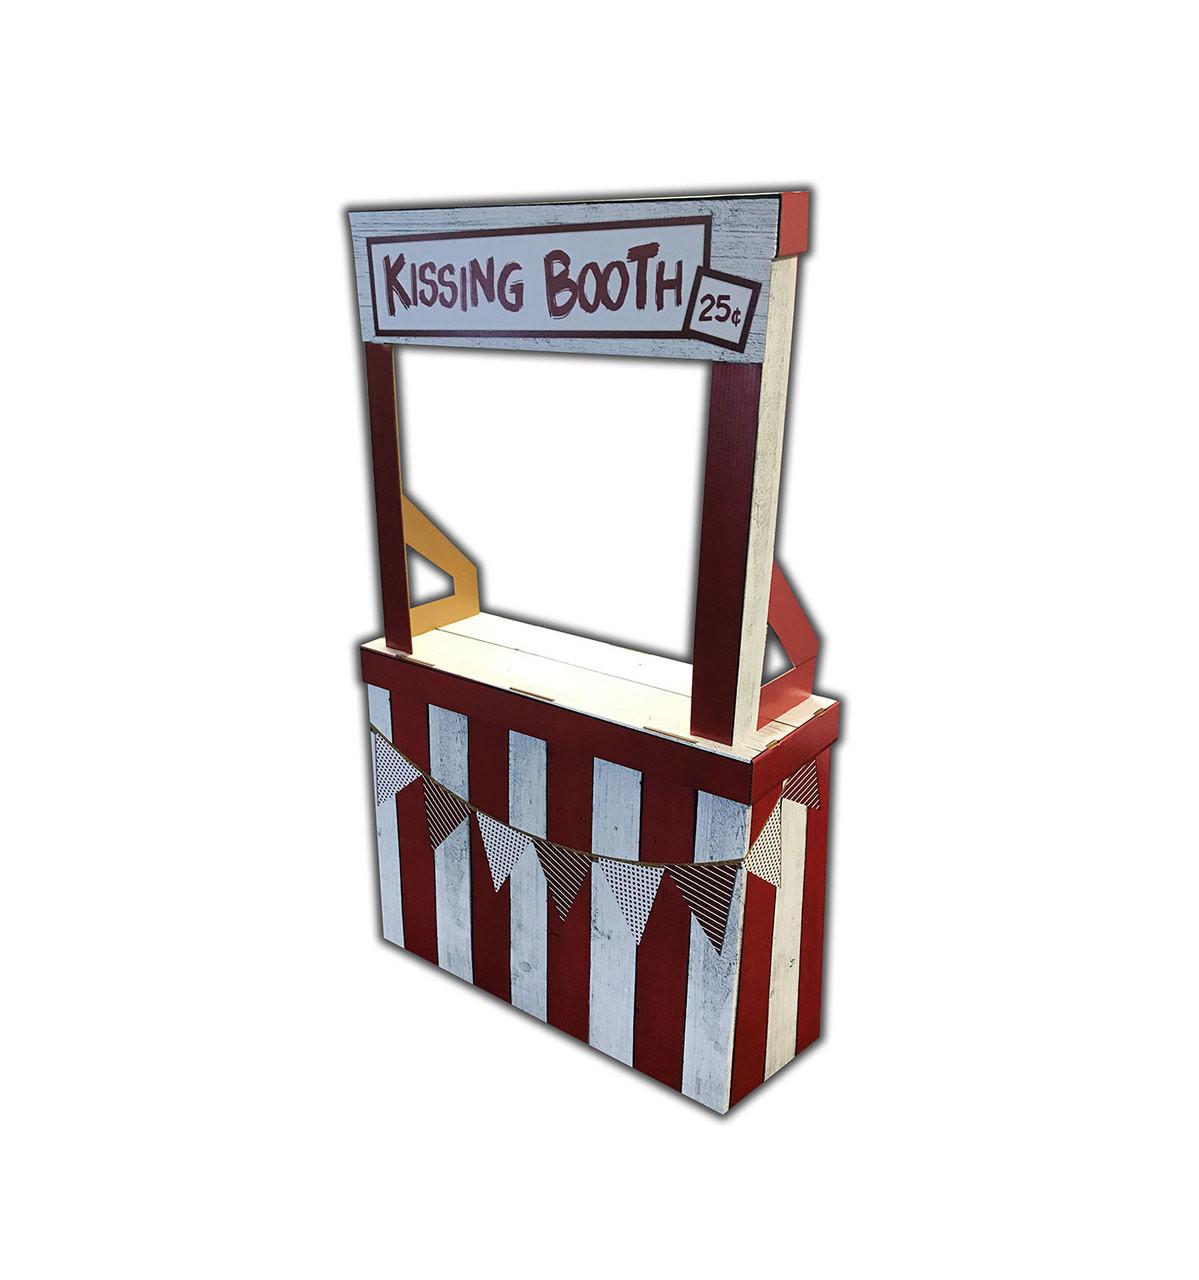 Life-size Kissing Booth Cardboard Standup | Cardboard Cutout 4